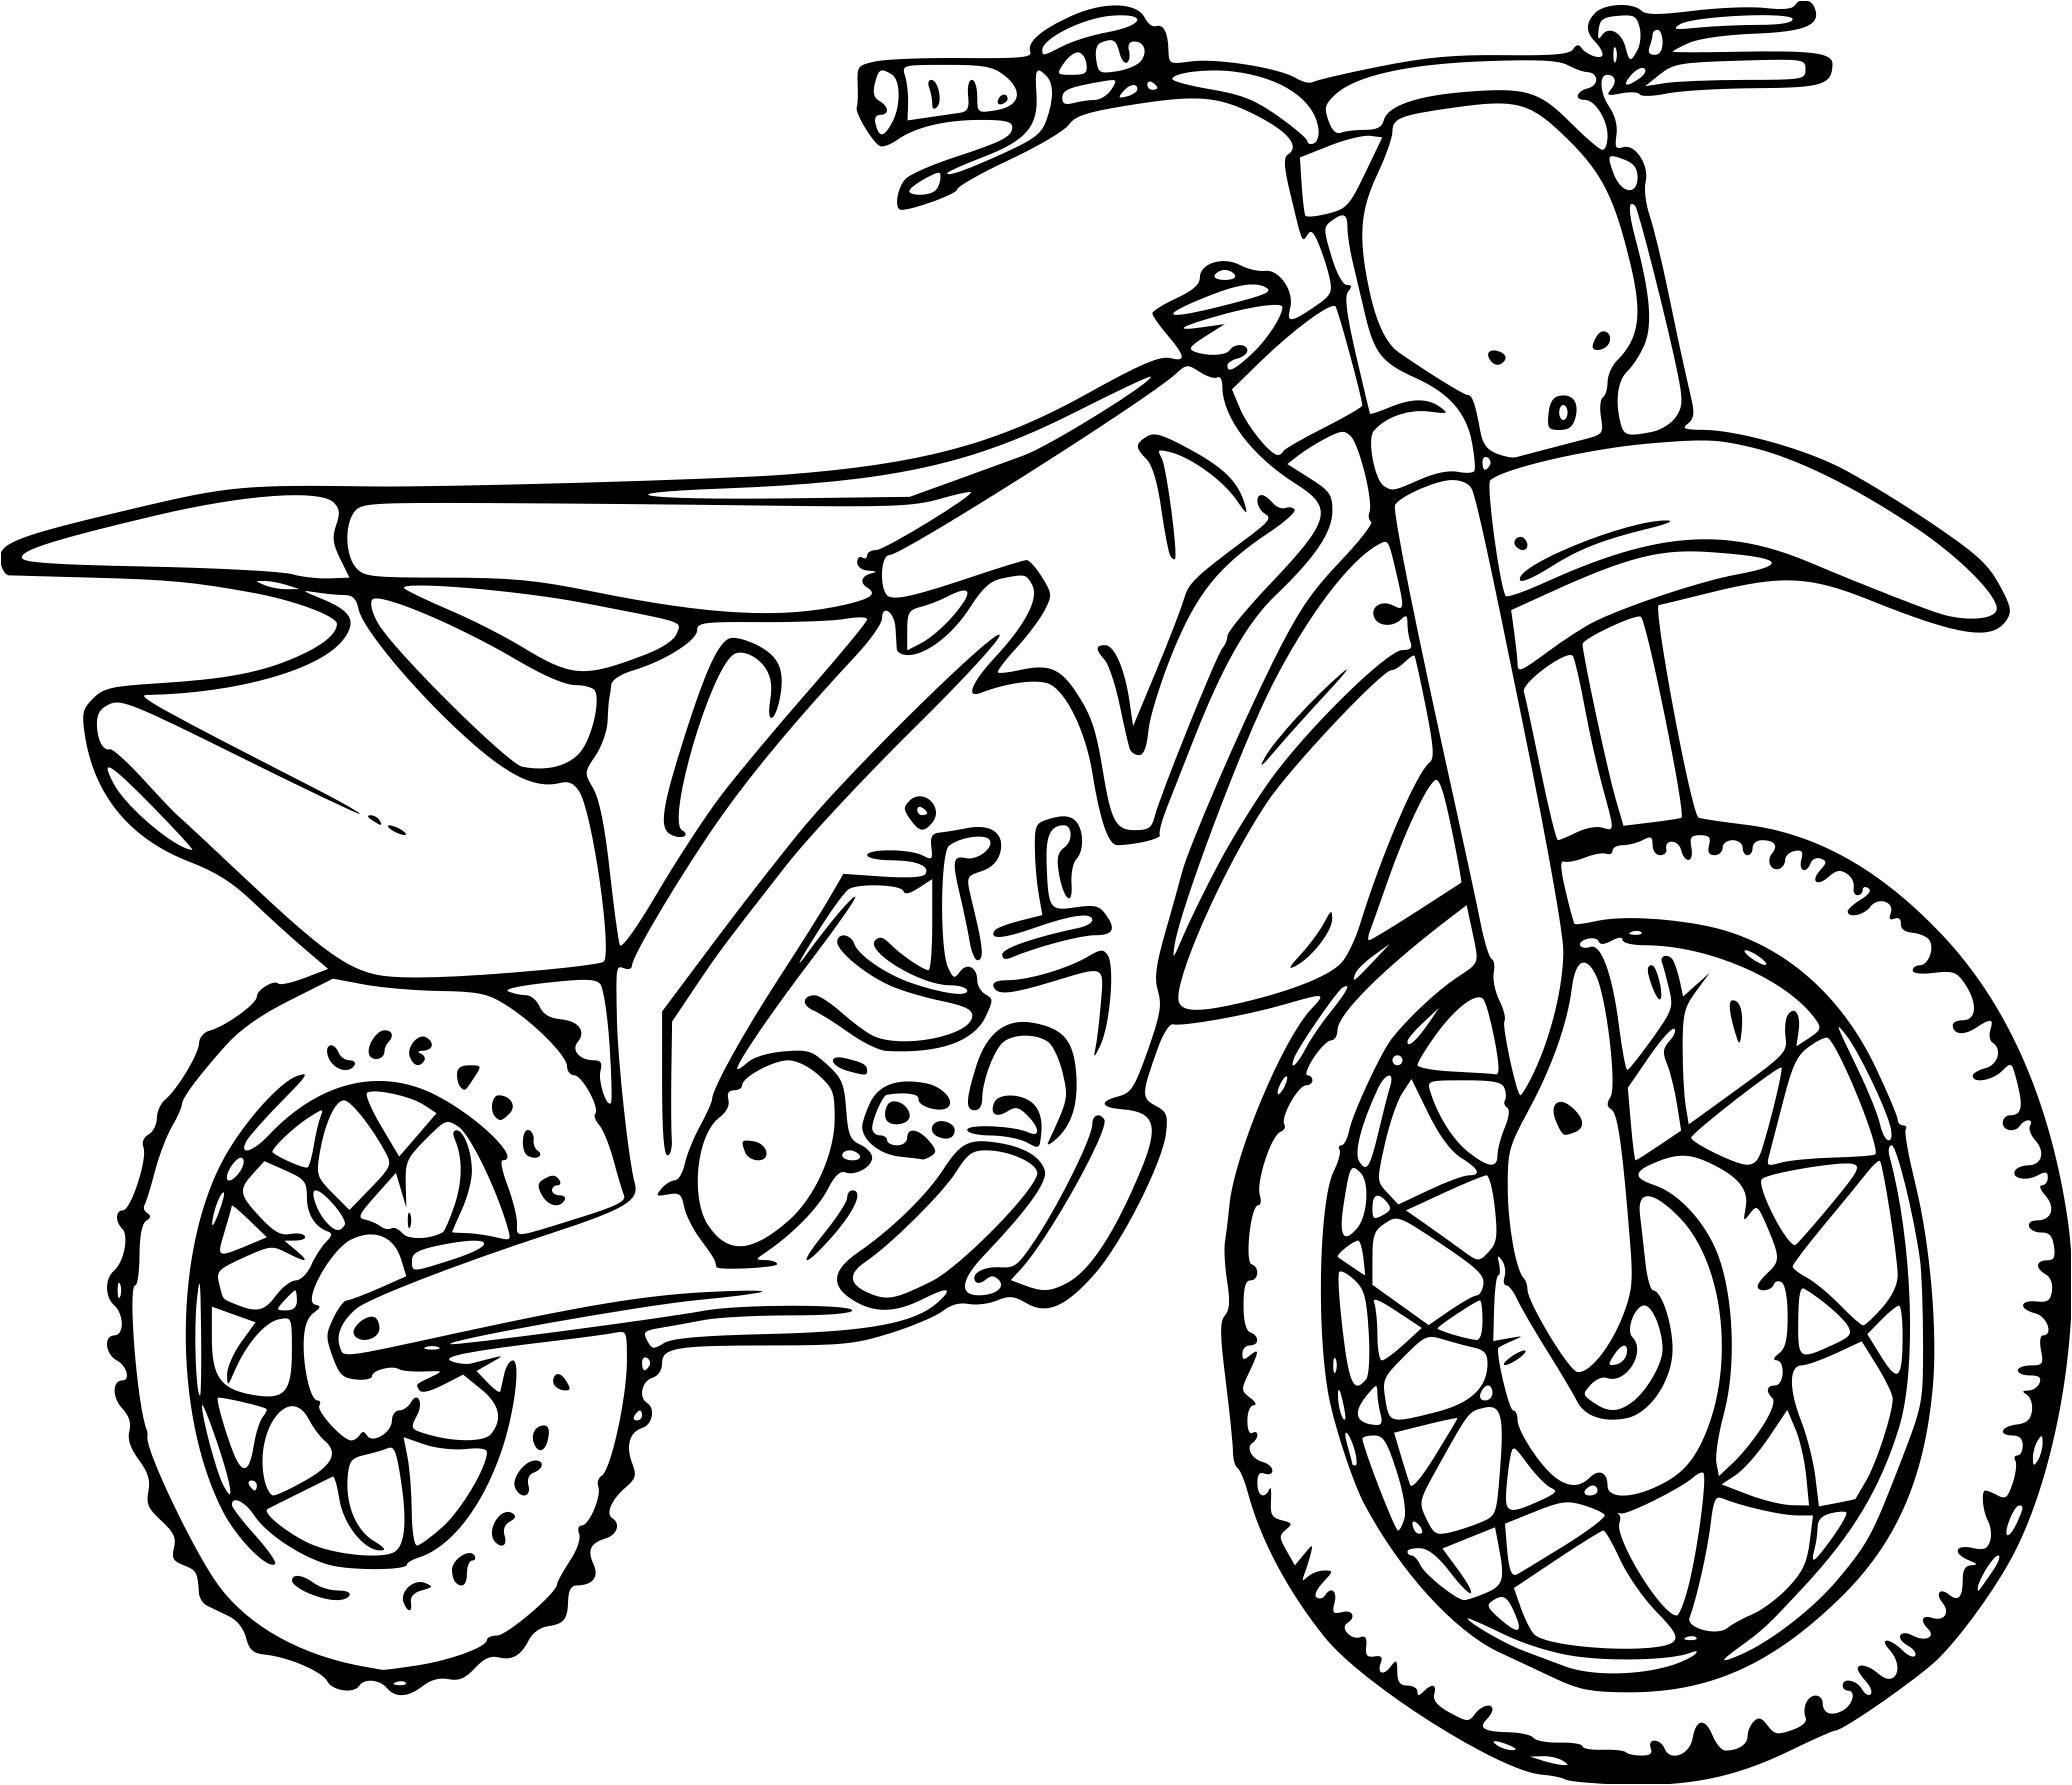 Coloriage Pelleteuse Frais Inspirant Dessin Coloriage Moto Cross